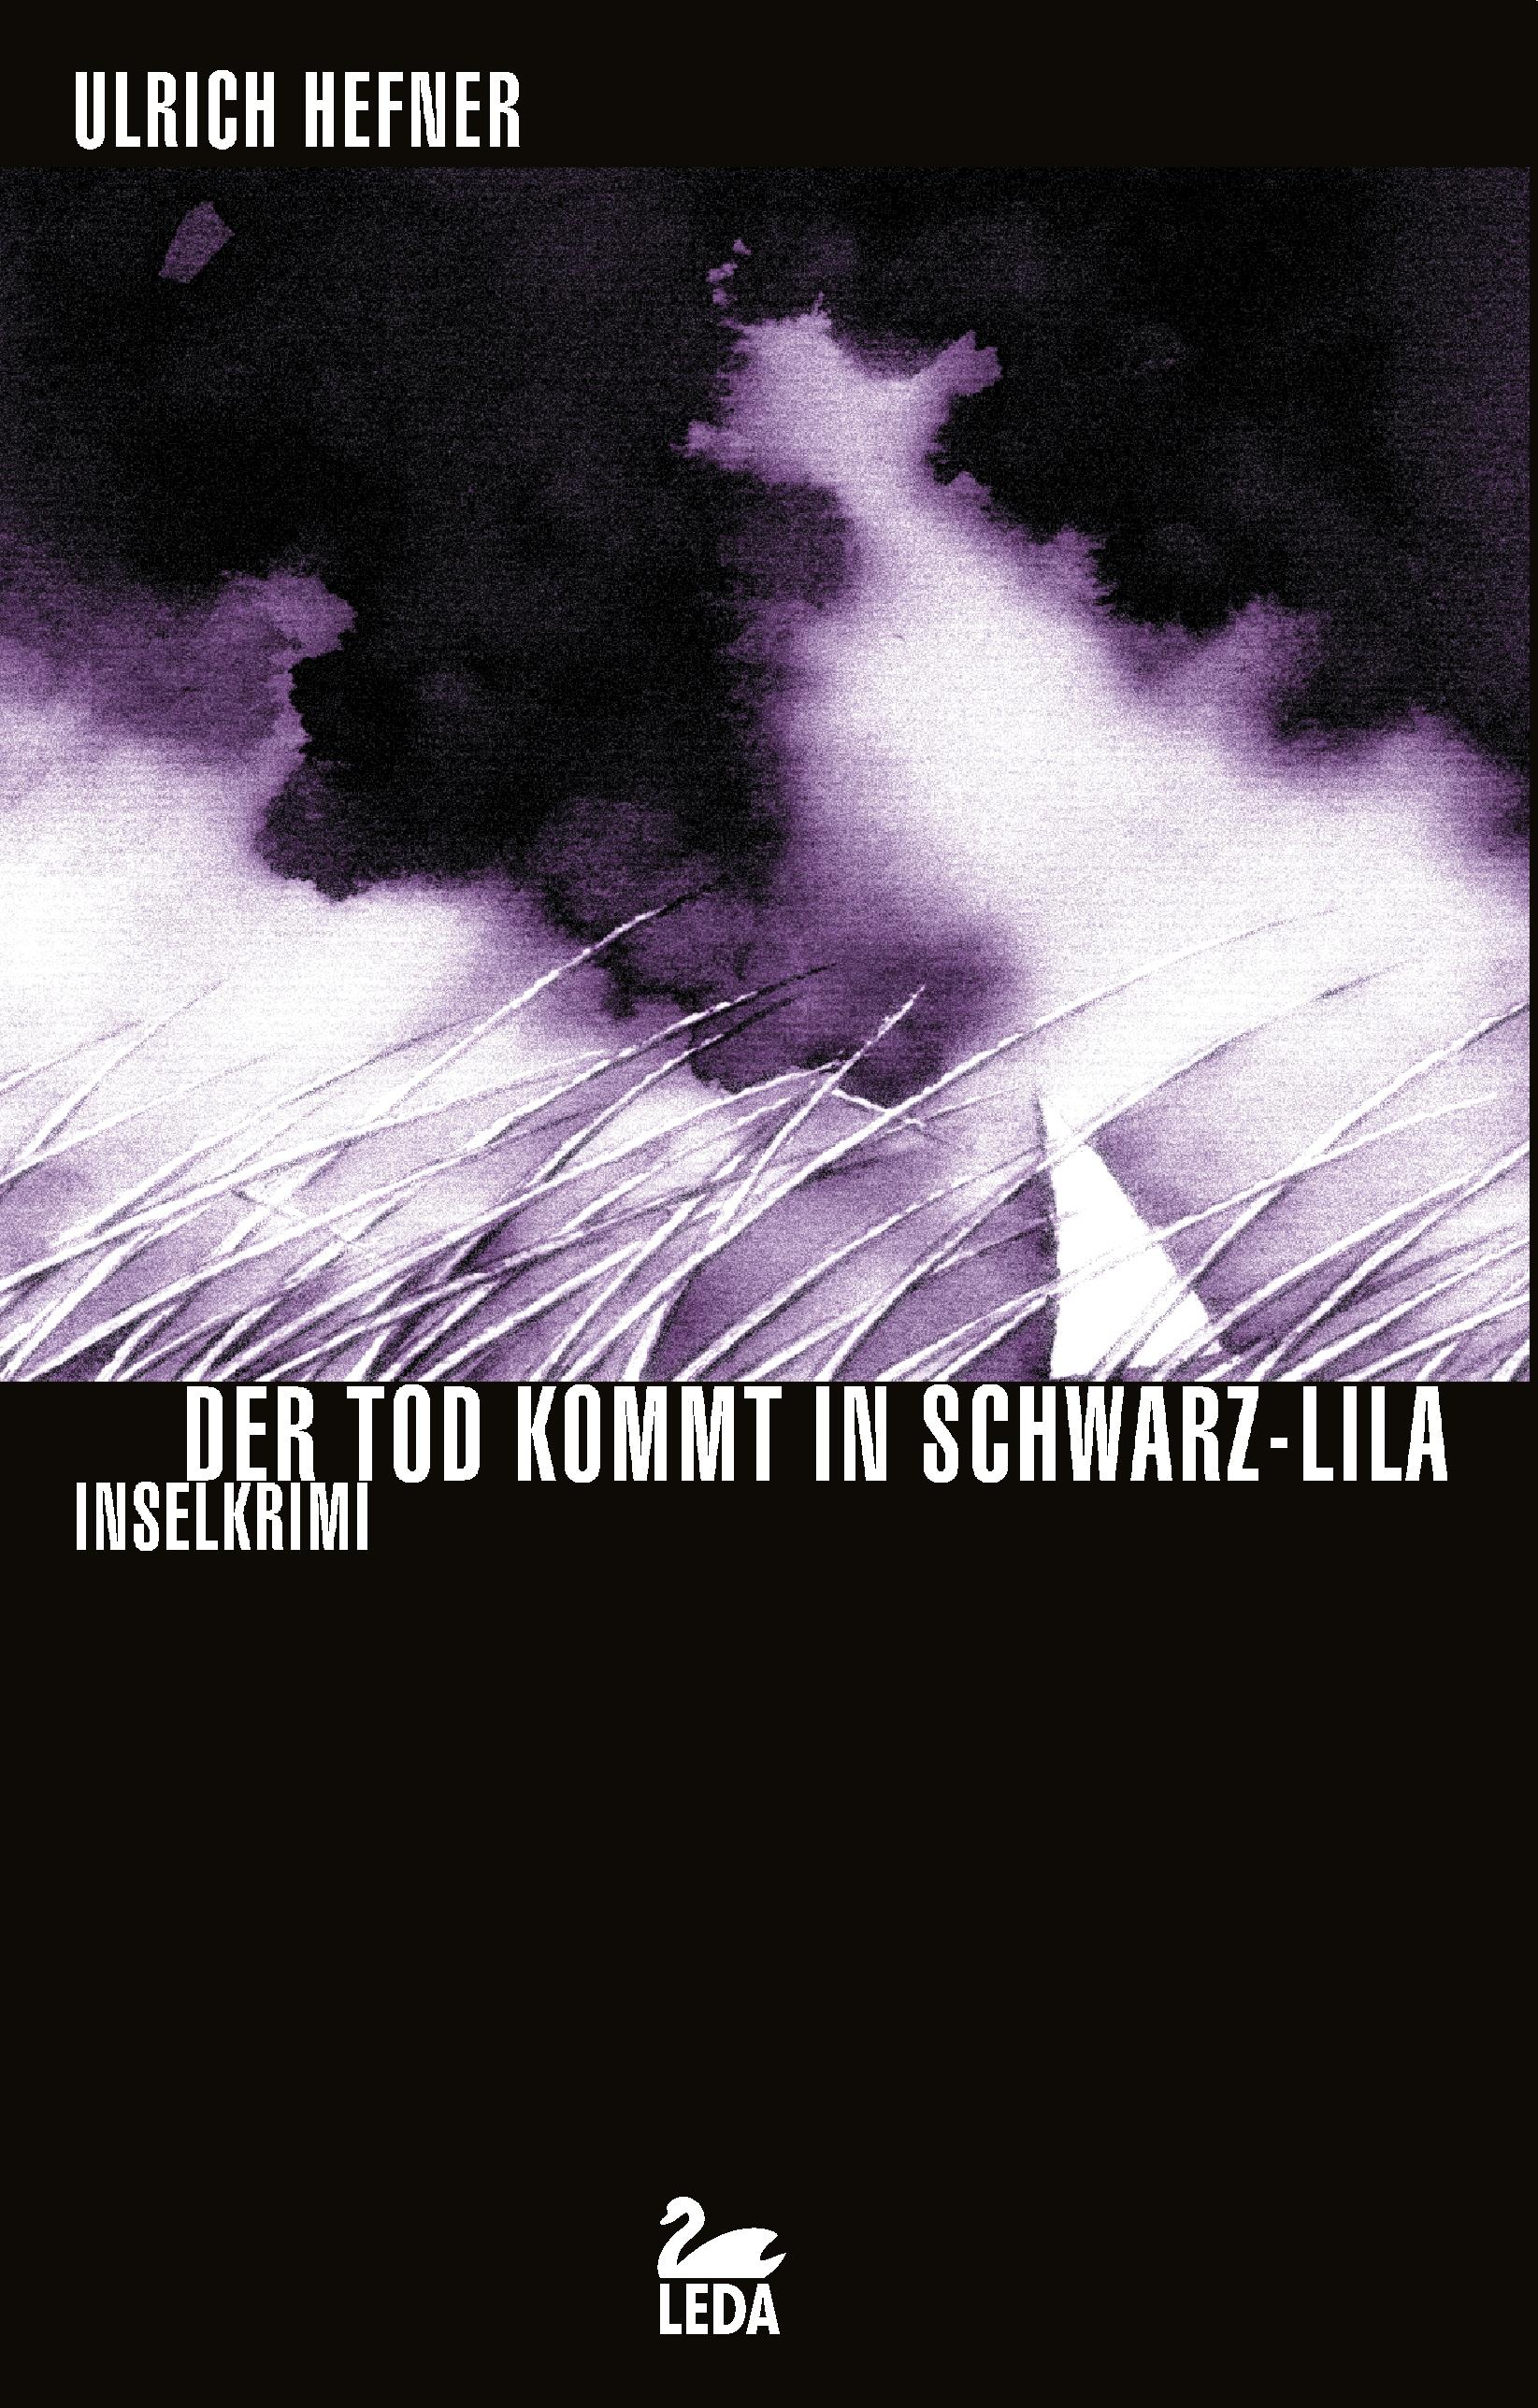 Der Tod kommt in Schwarz-Lila: Inselkrimi - Ulrich Hefner